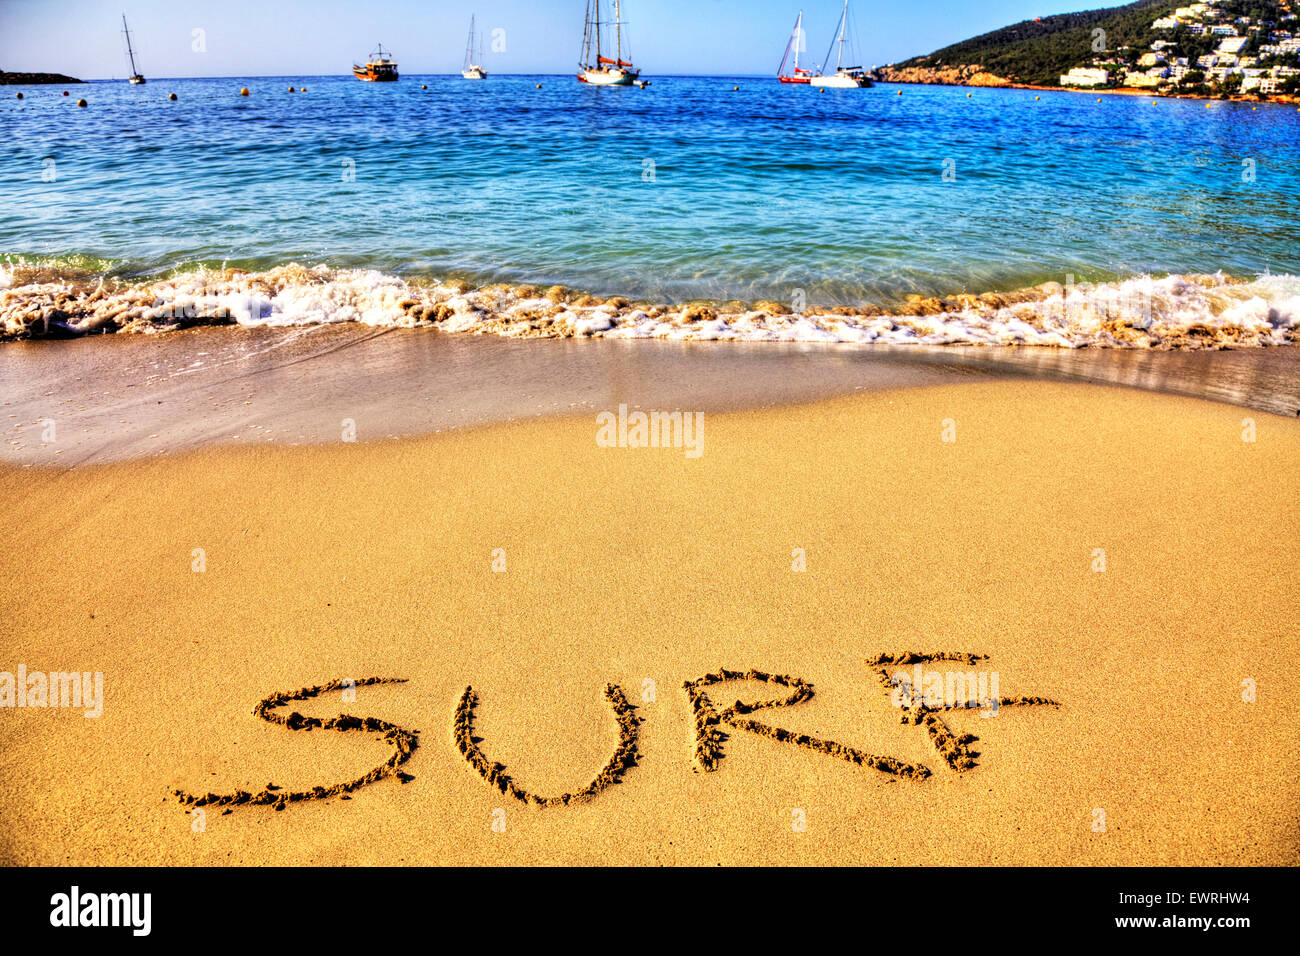 Surf word in sand written on beach sea coast coastline holiday getaway Ibiza Spain Santa Eulalia Spanish - Stock Image